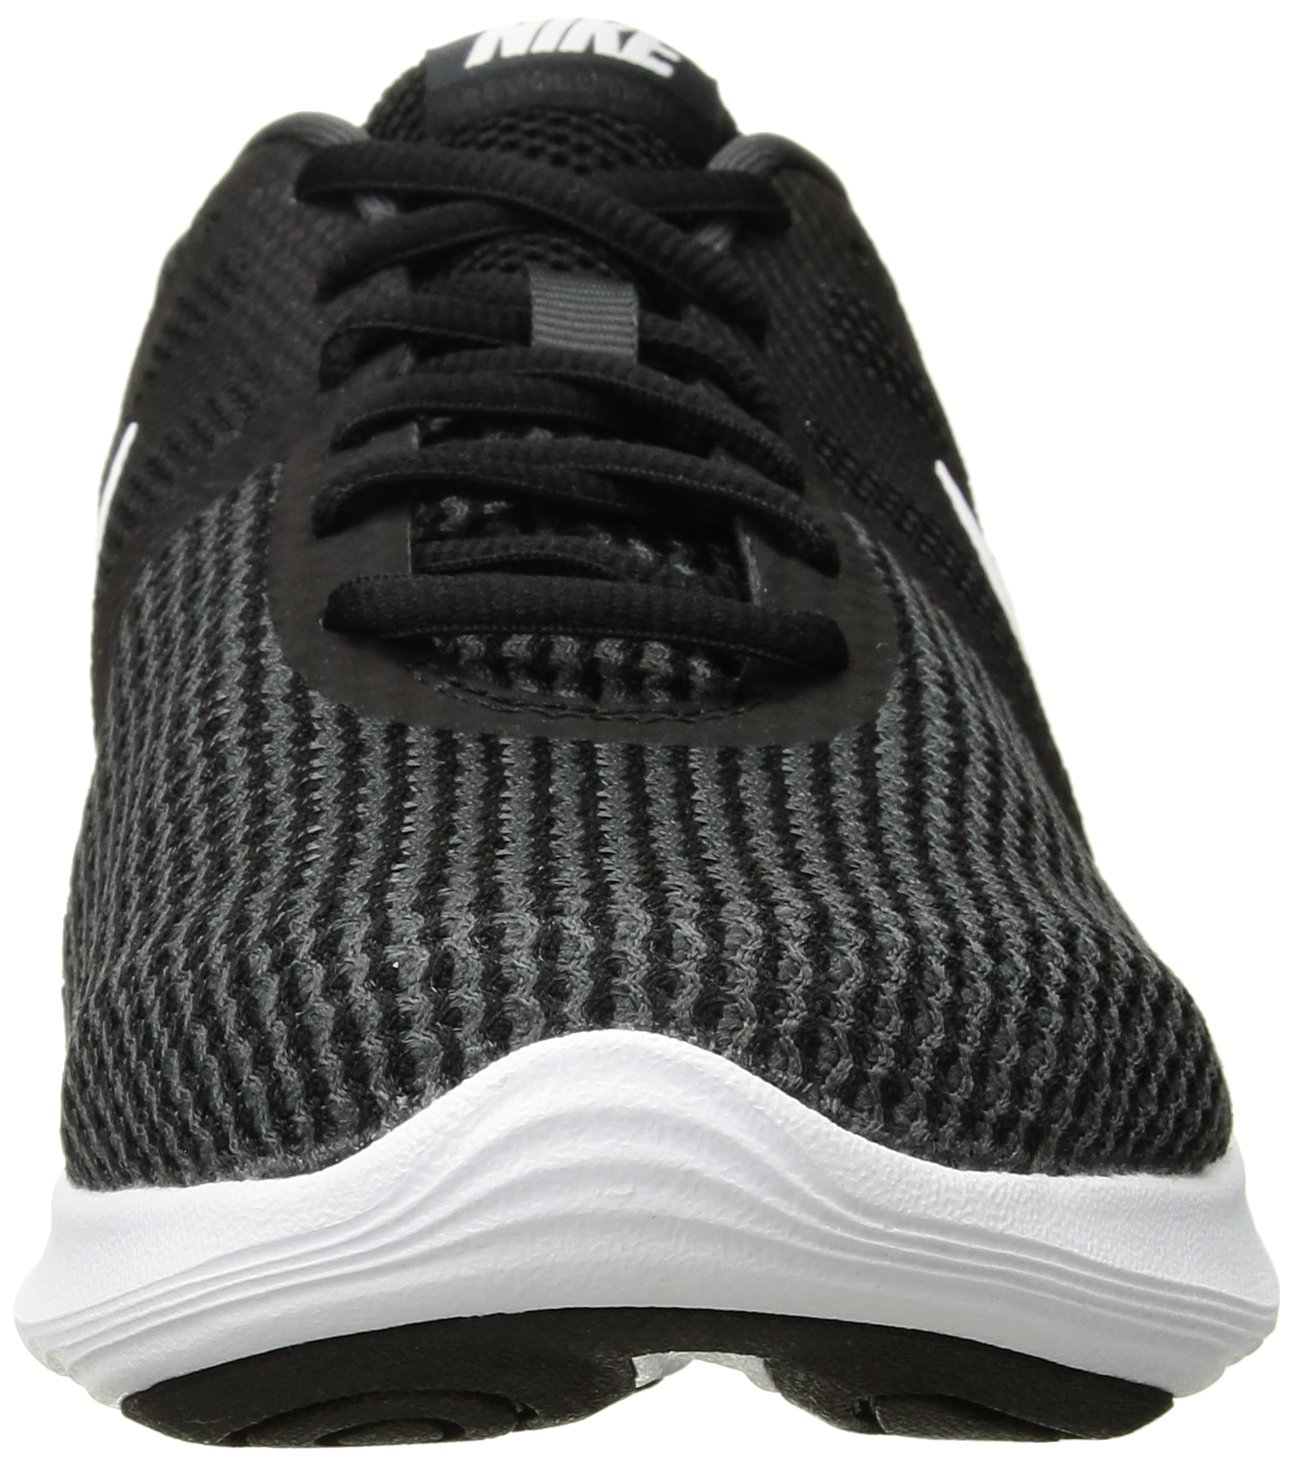 NIKE Women's Revolution 4 B(M) Running Shoe B06XK9Y2HZ 10 B(M) 4 US|Black/White-anthracite 6d0026